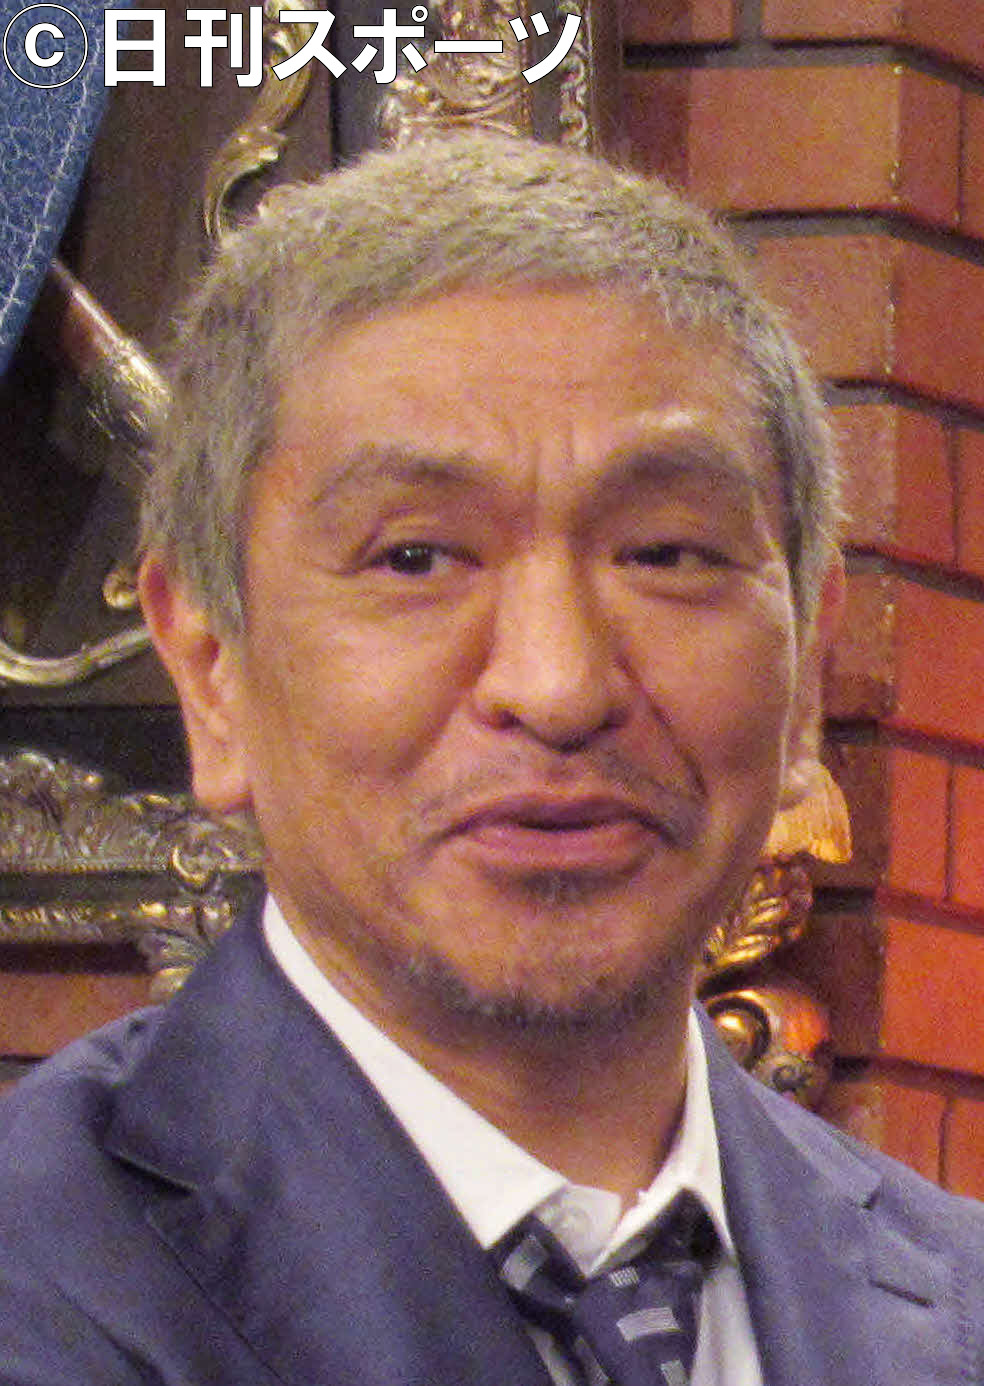 松本人志(2019年10月25日撮影)